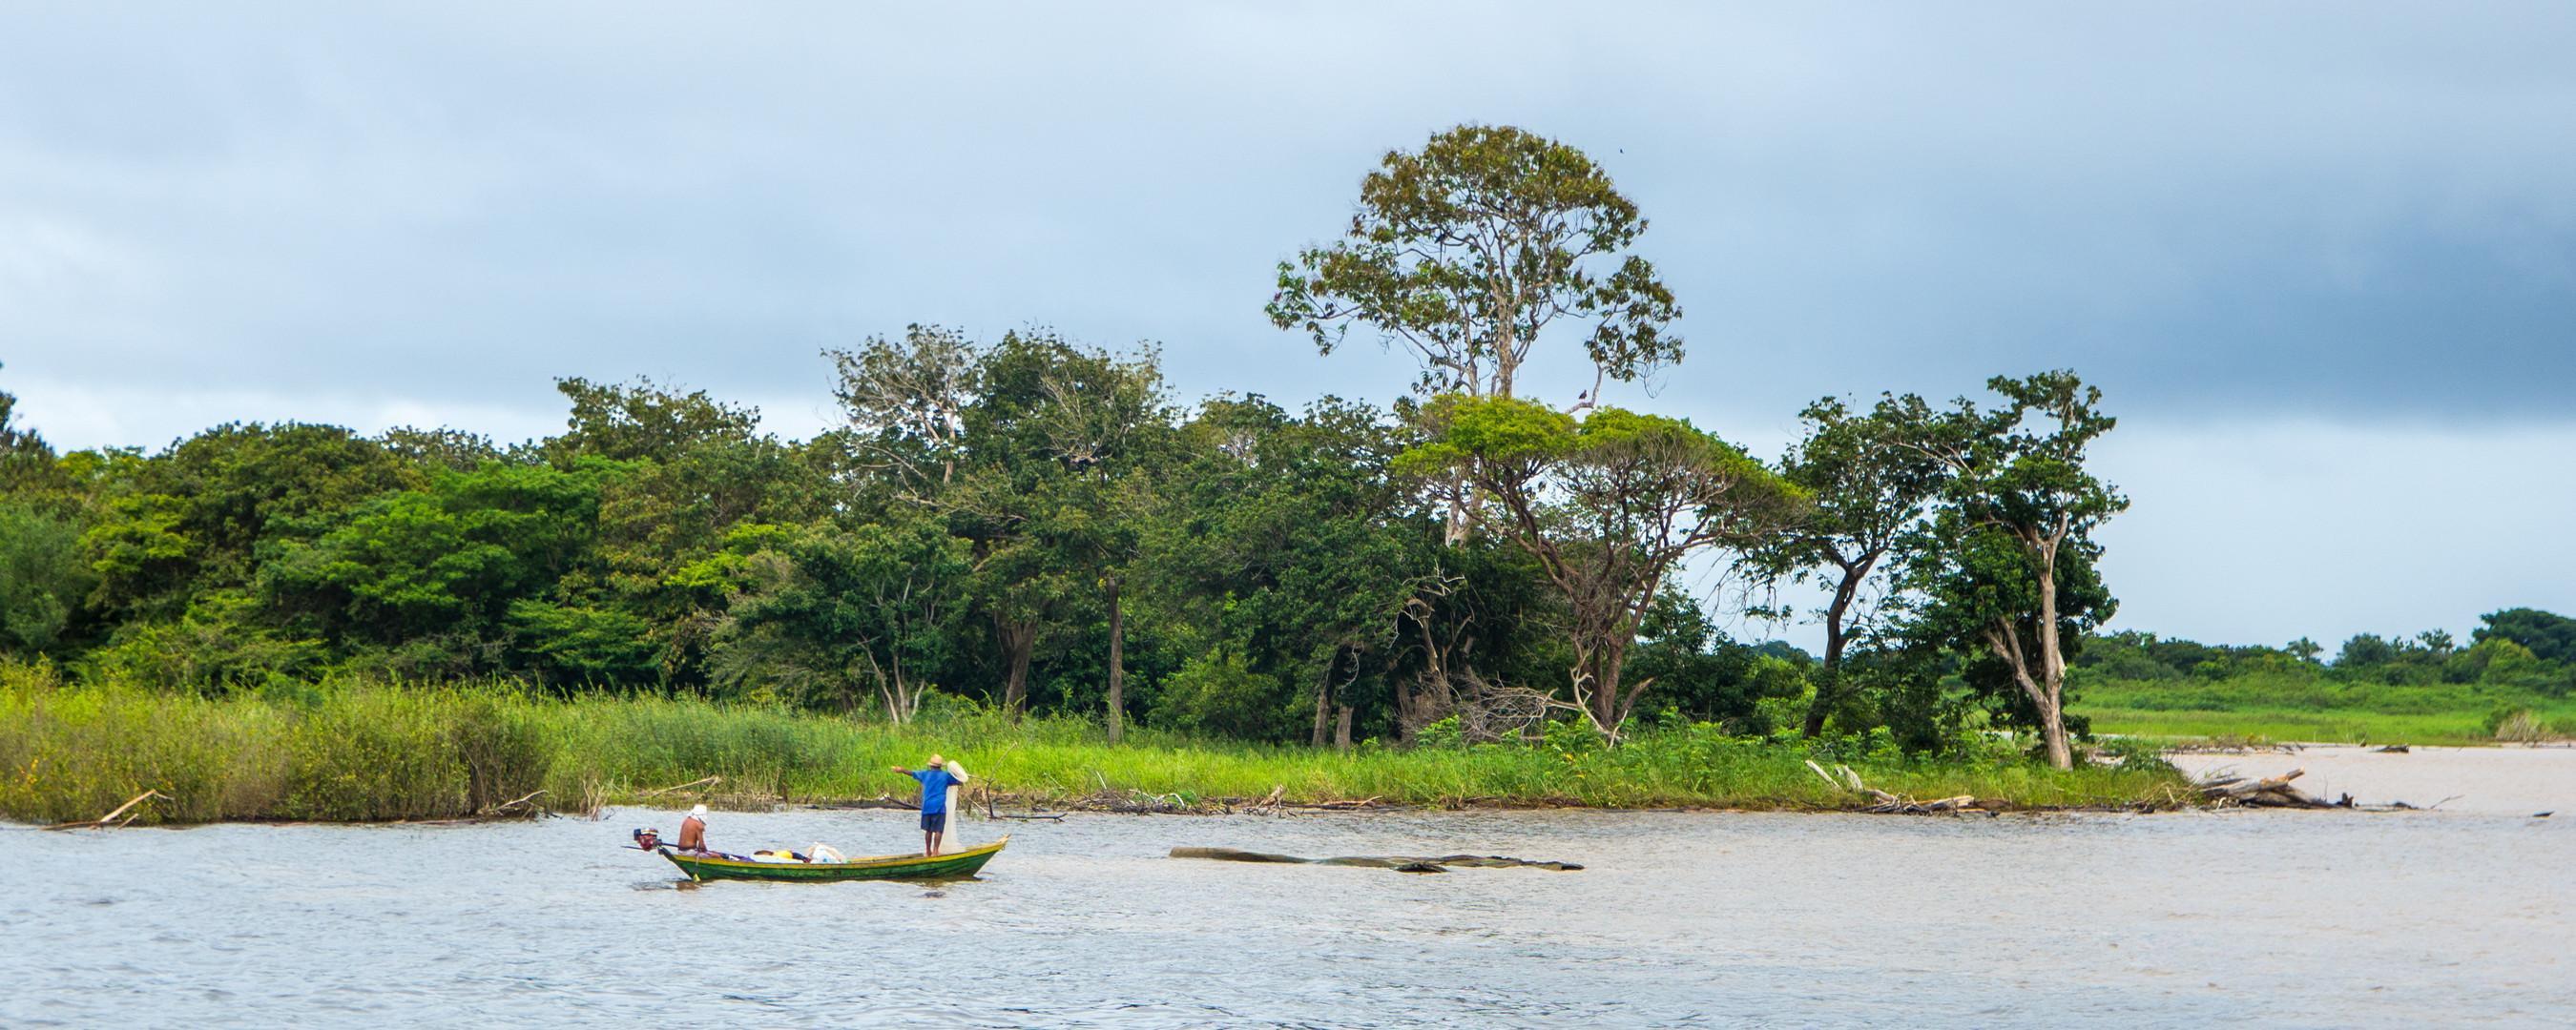 Santeram - Brazil